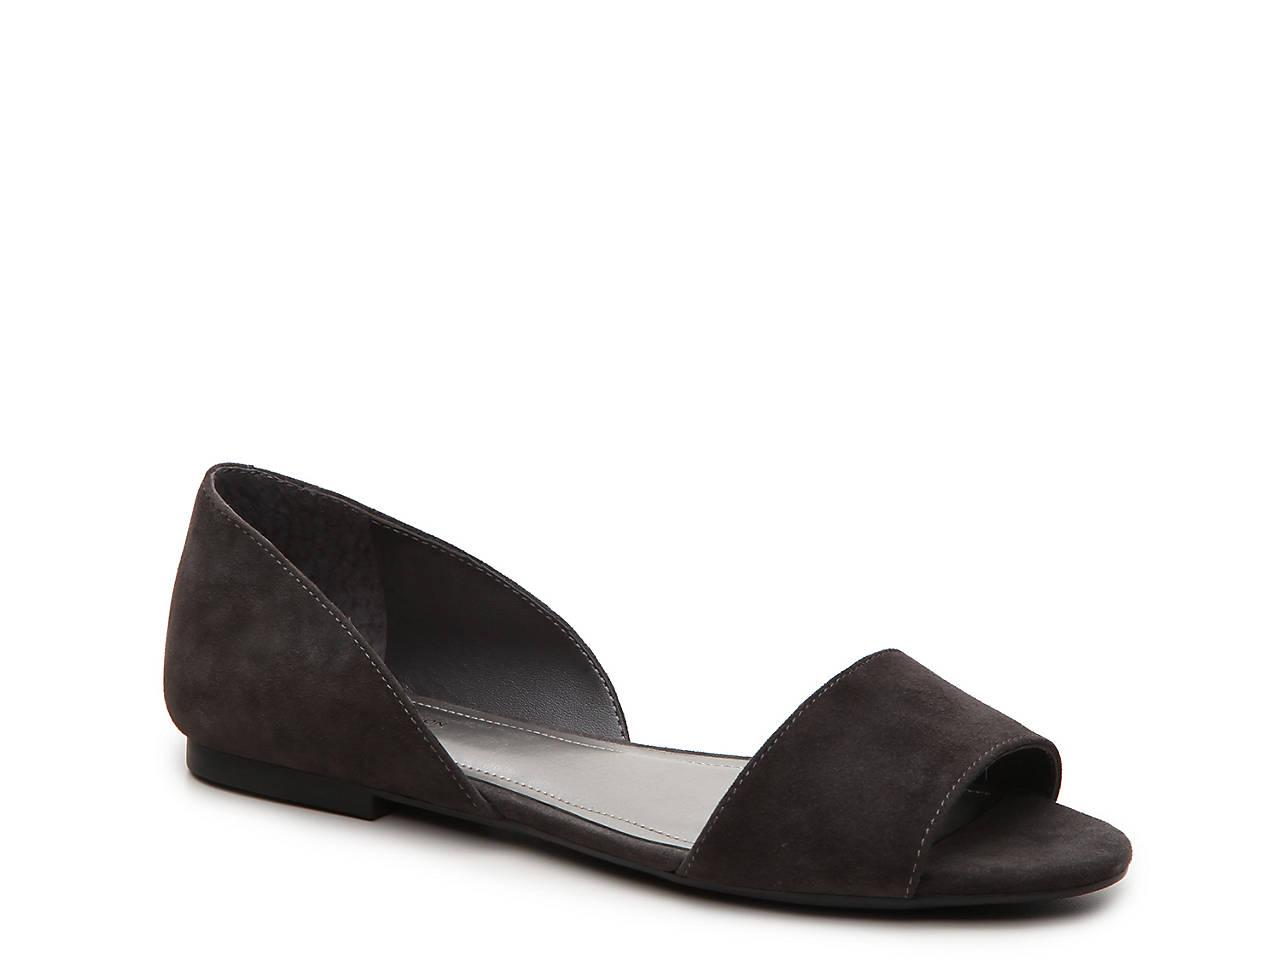 b36d9c871f5 BCBGeneration Fatimah Flat Sandal Women s Shoes